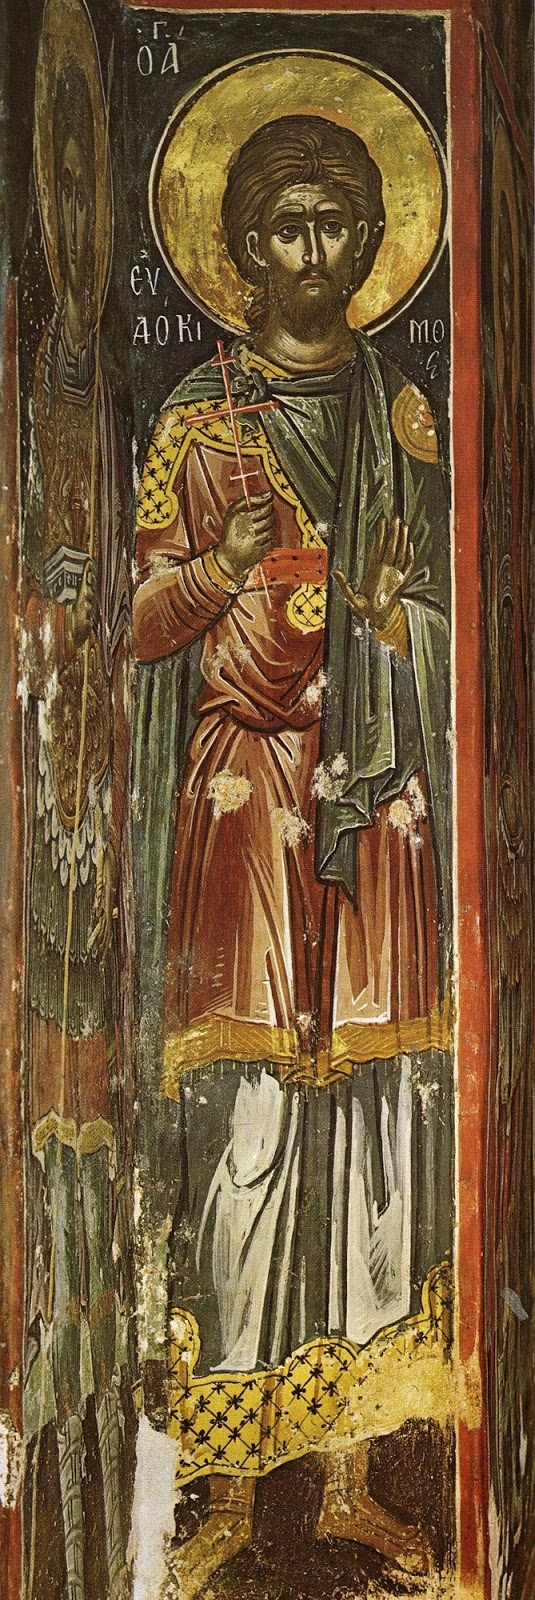 St. Evdokimos the Righteous